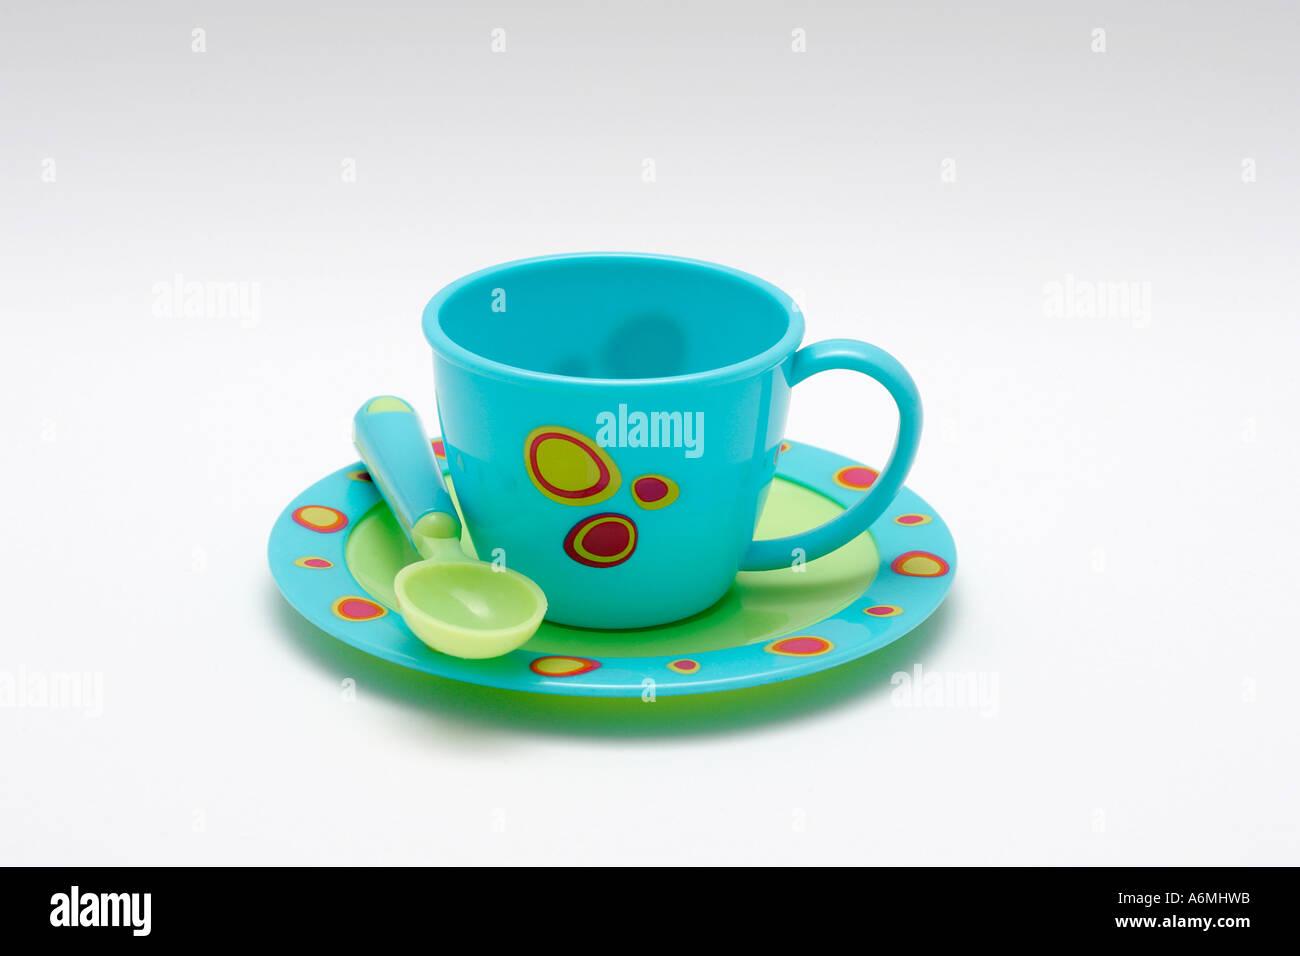 ffa978f1d7d coffee cup spoon studio shot symbol multicolored concept conceptual  creative creativity education school fancy fantasy florid · i creative / Alamy  Stock ...